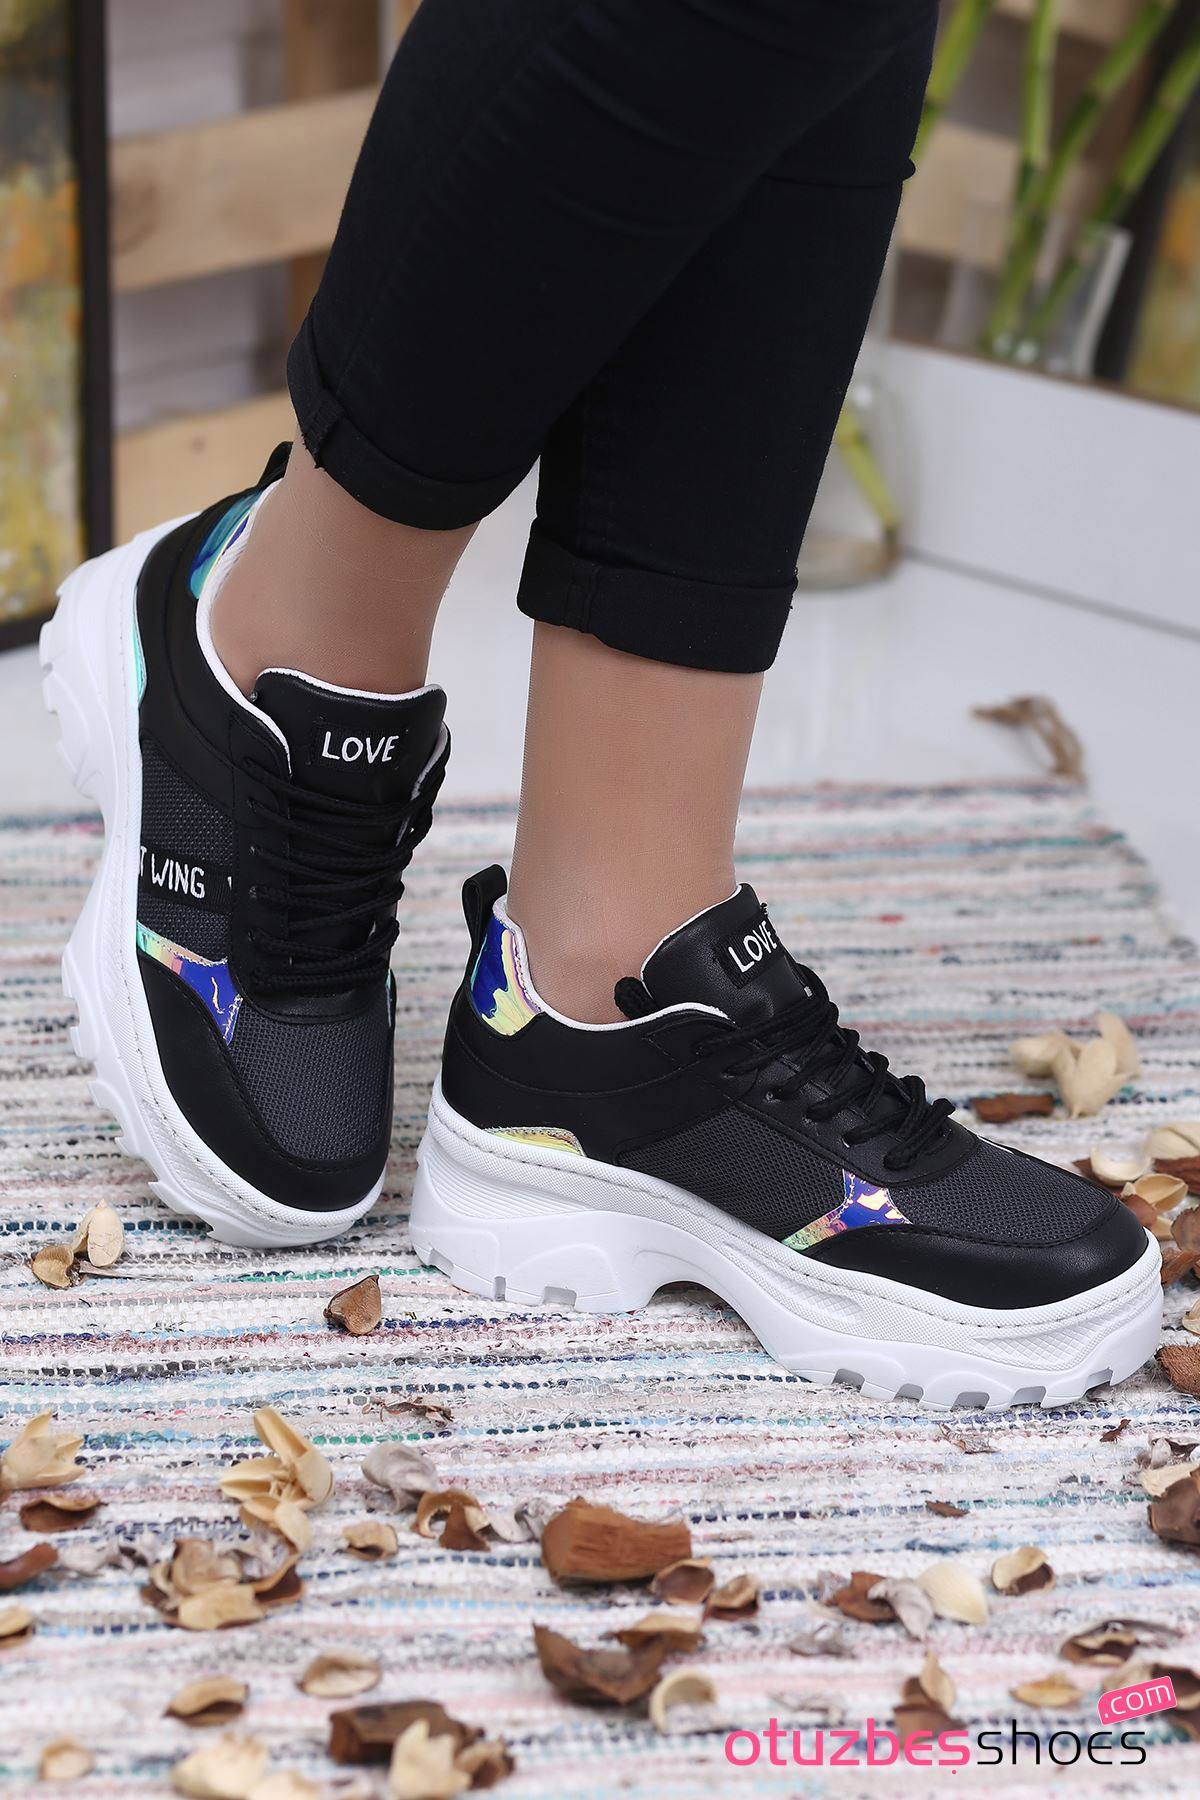 Lana Mat Deri Hologram Detay Bayan Spor Ayakkabı Siyah